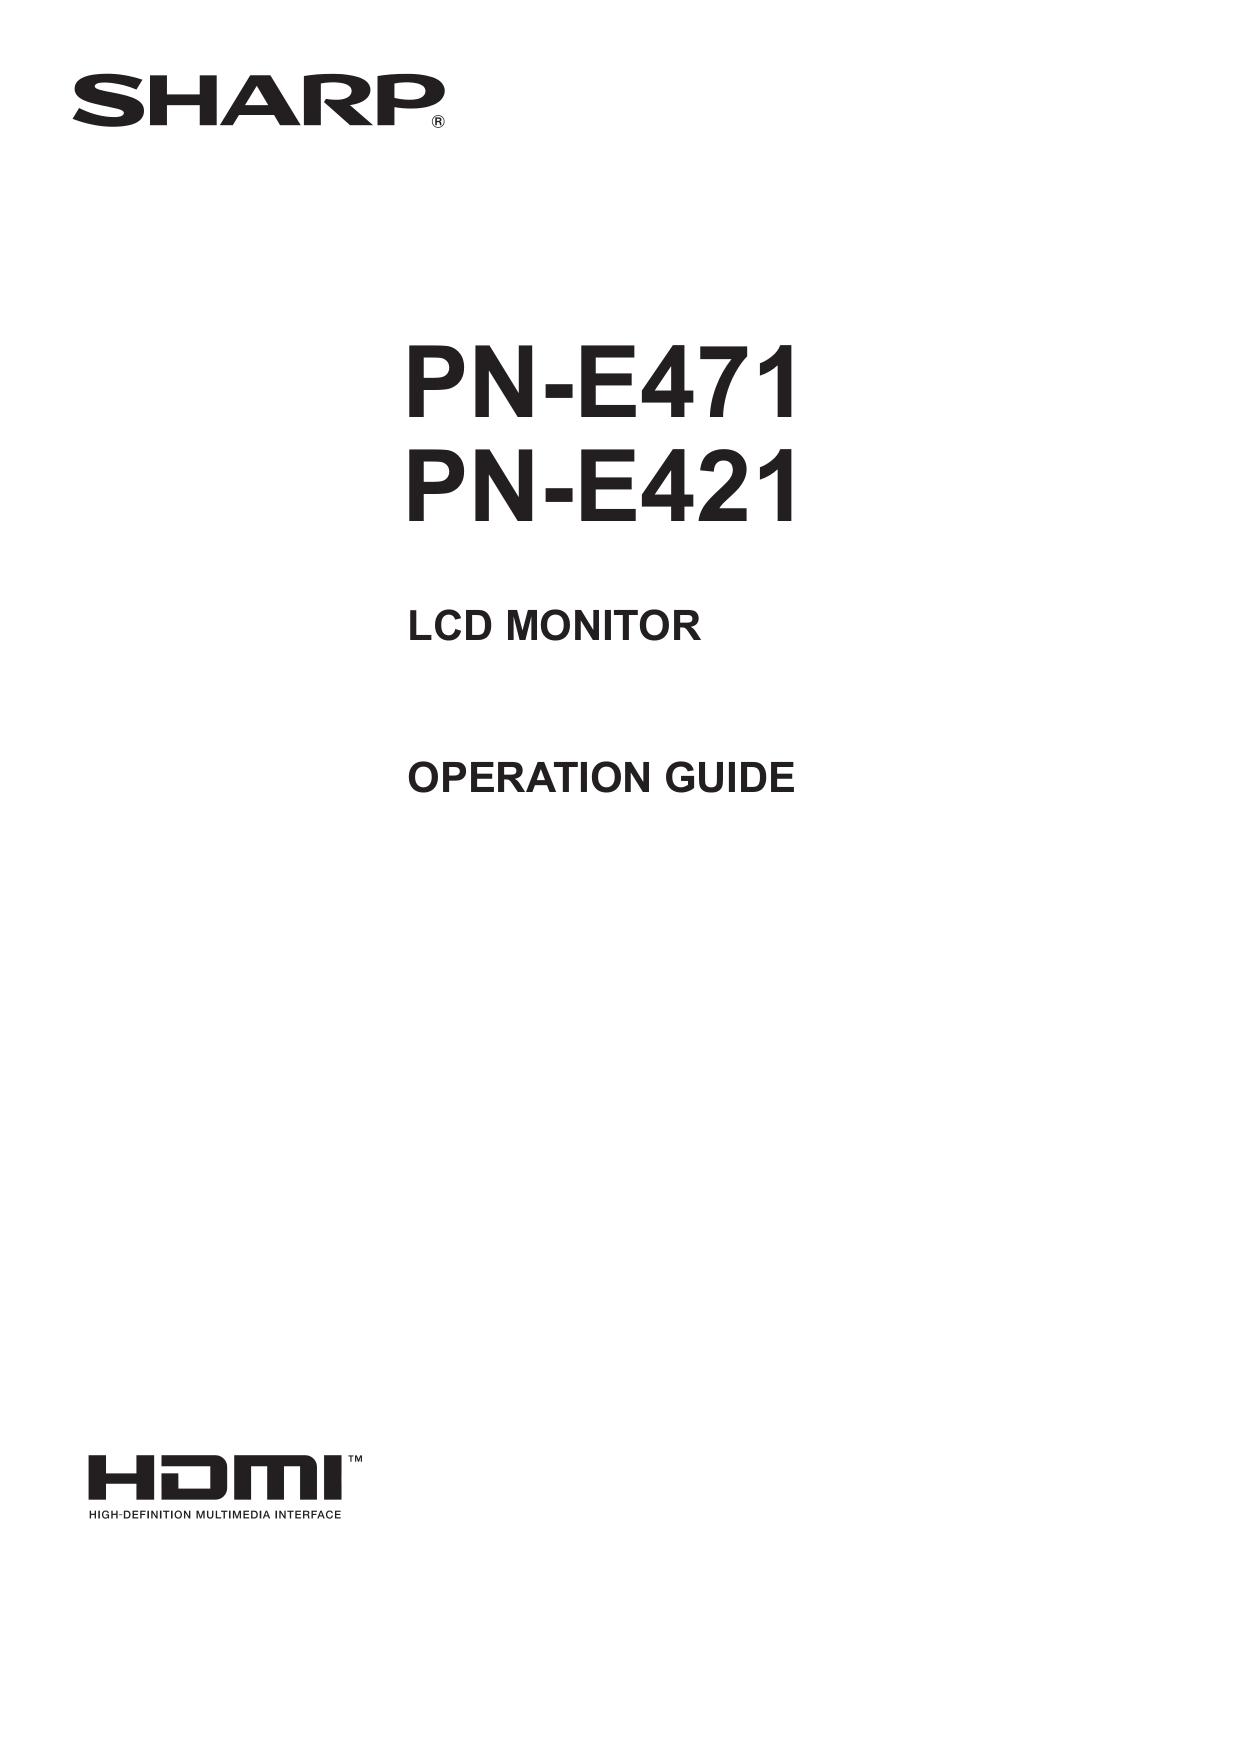 Download free pdf for Sharp PN-E471 Monitor manual